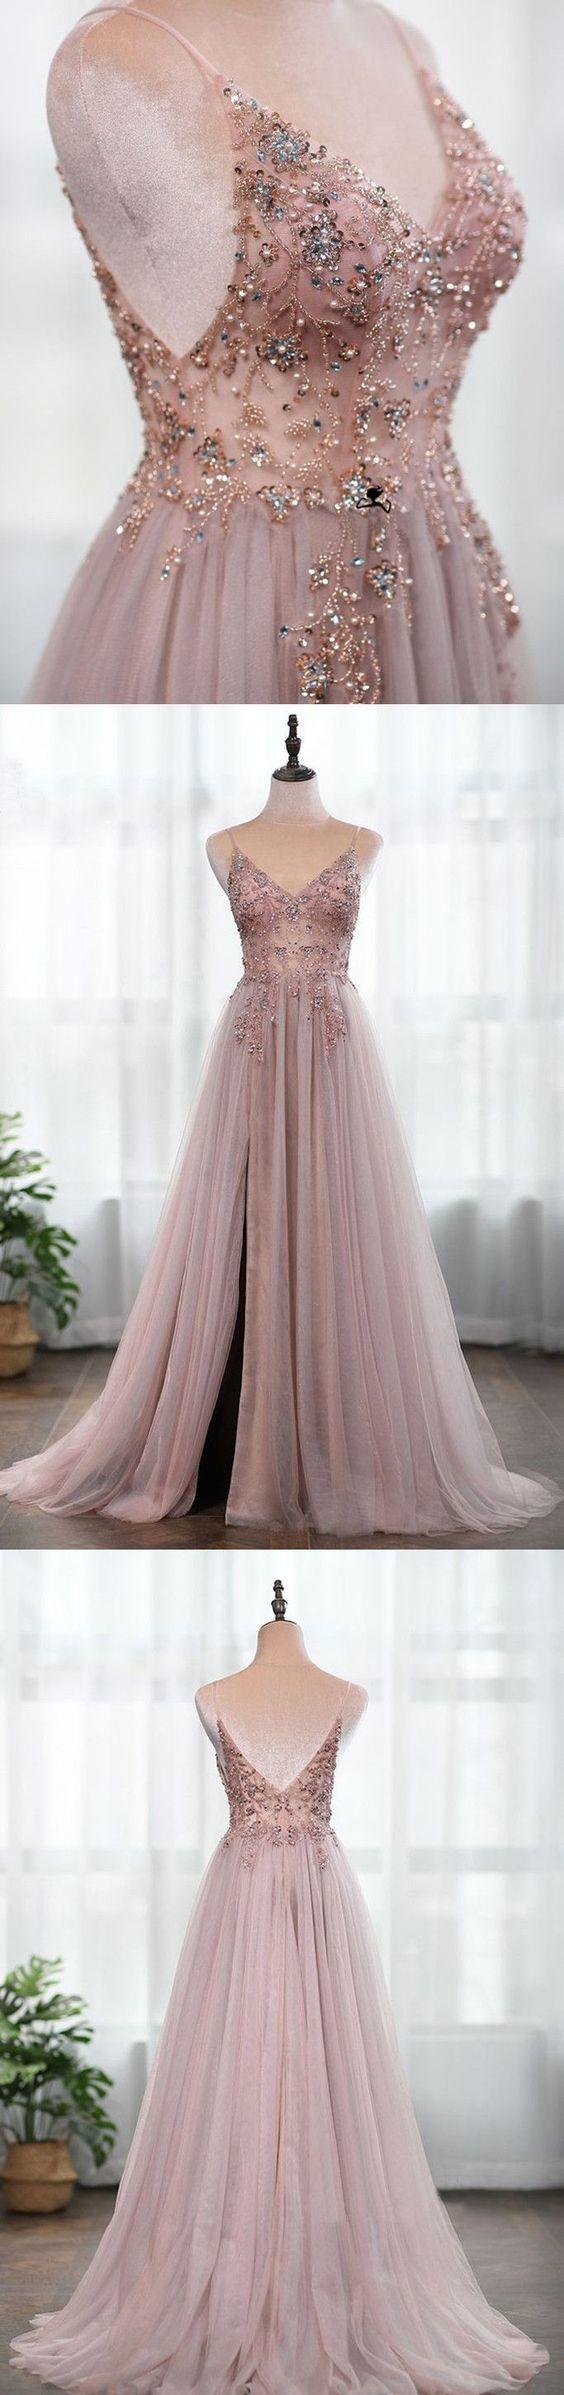 A Line Spaghetti Straps Grey Long Prom Dress With Beading Split P2220